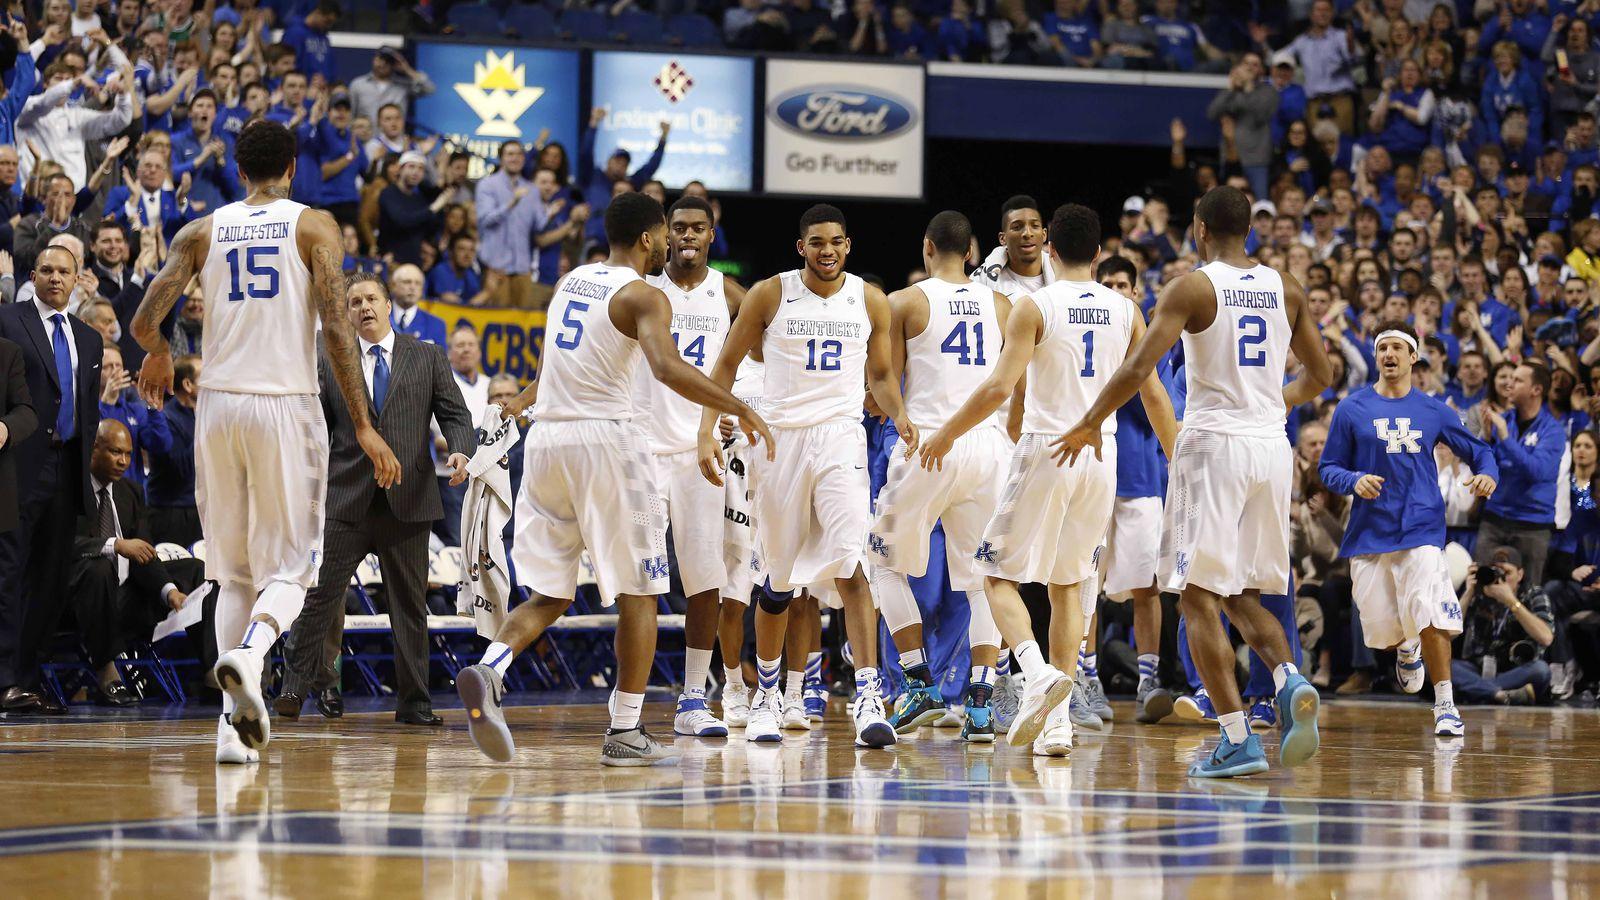 Uk Basketball: Arkansas Razorbacks 67, Kentucky Wildcats 84: Kentucky